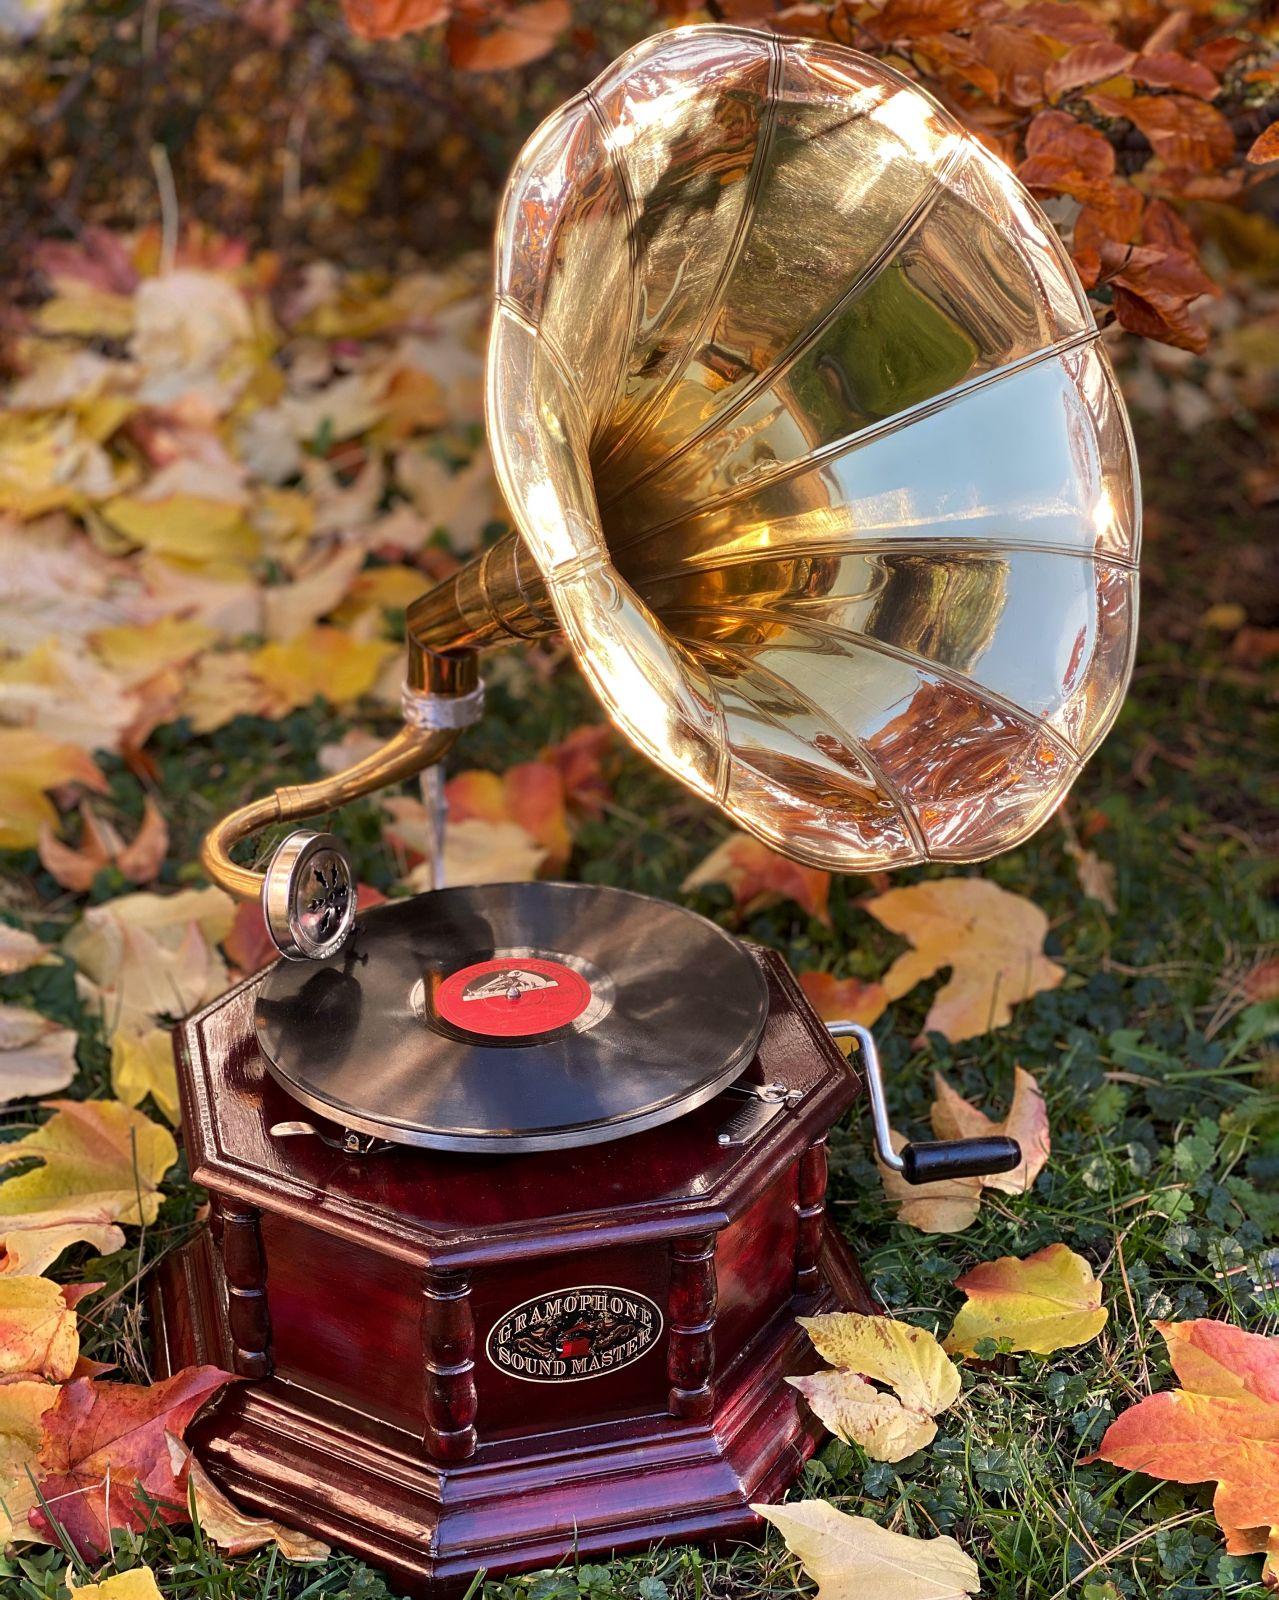 Gramophone replica vintage style BrokInCZ